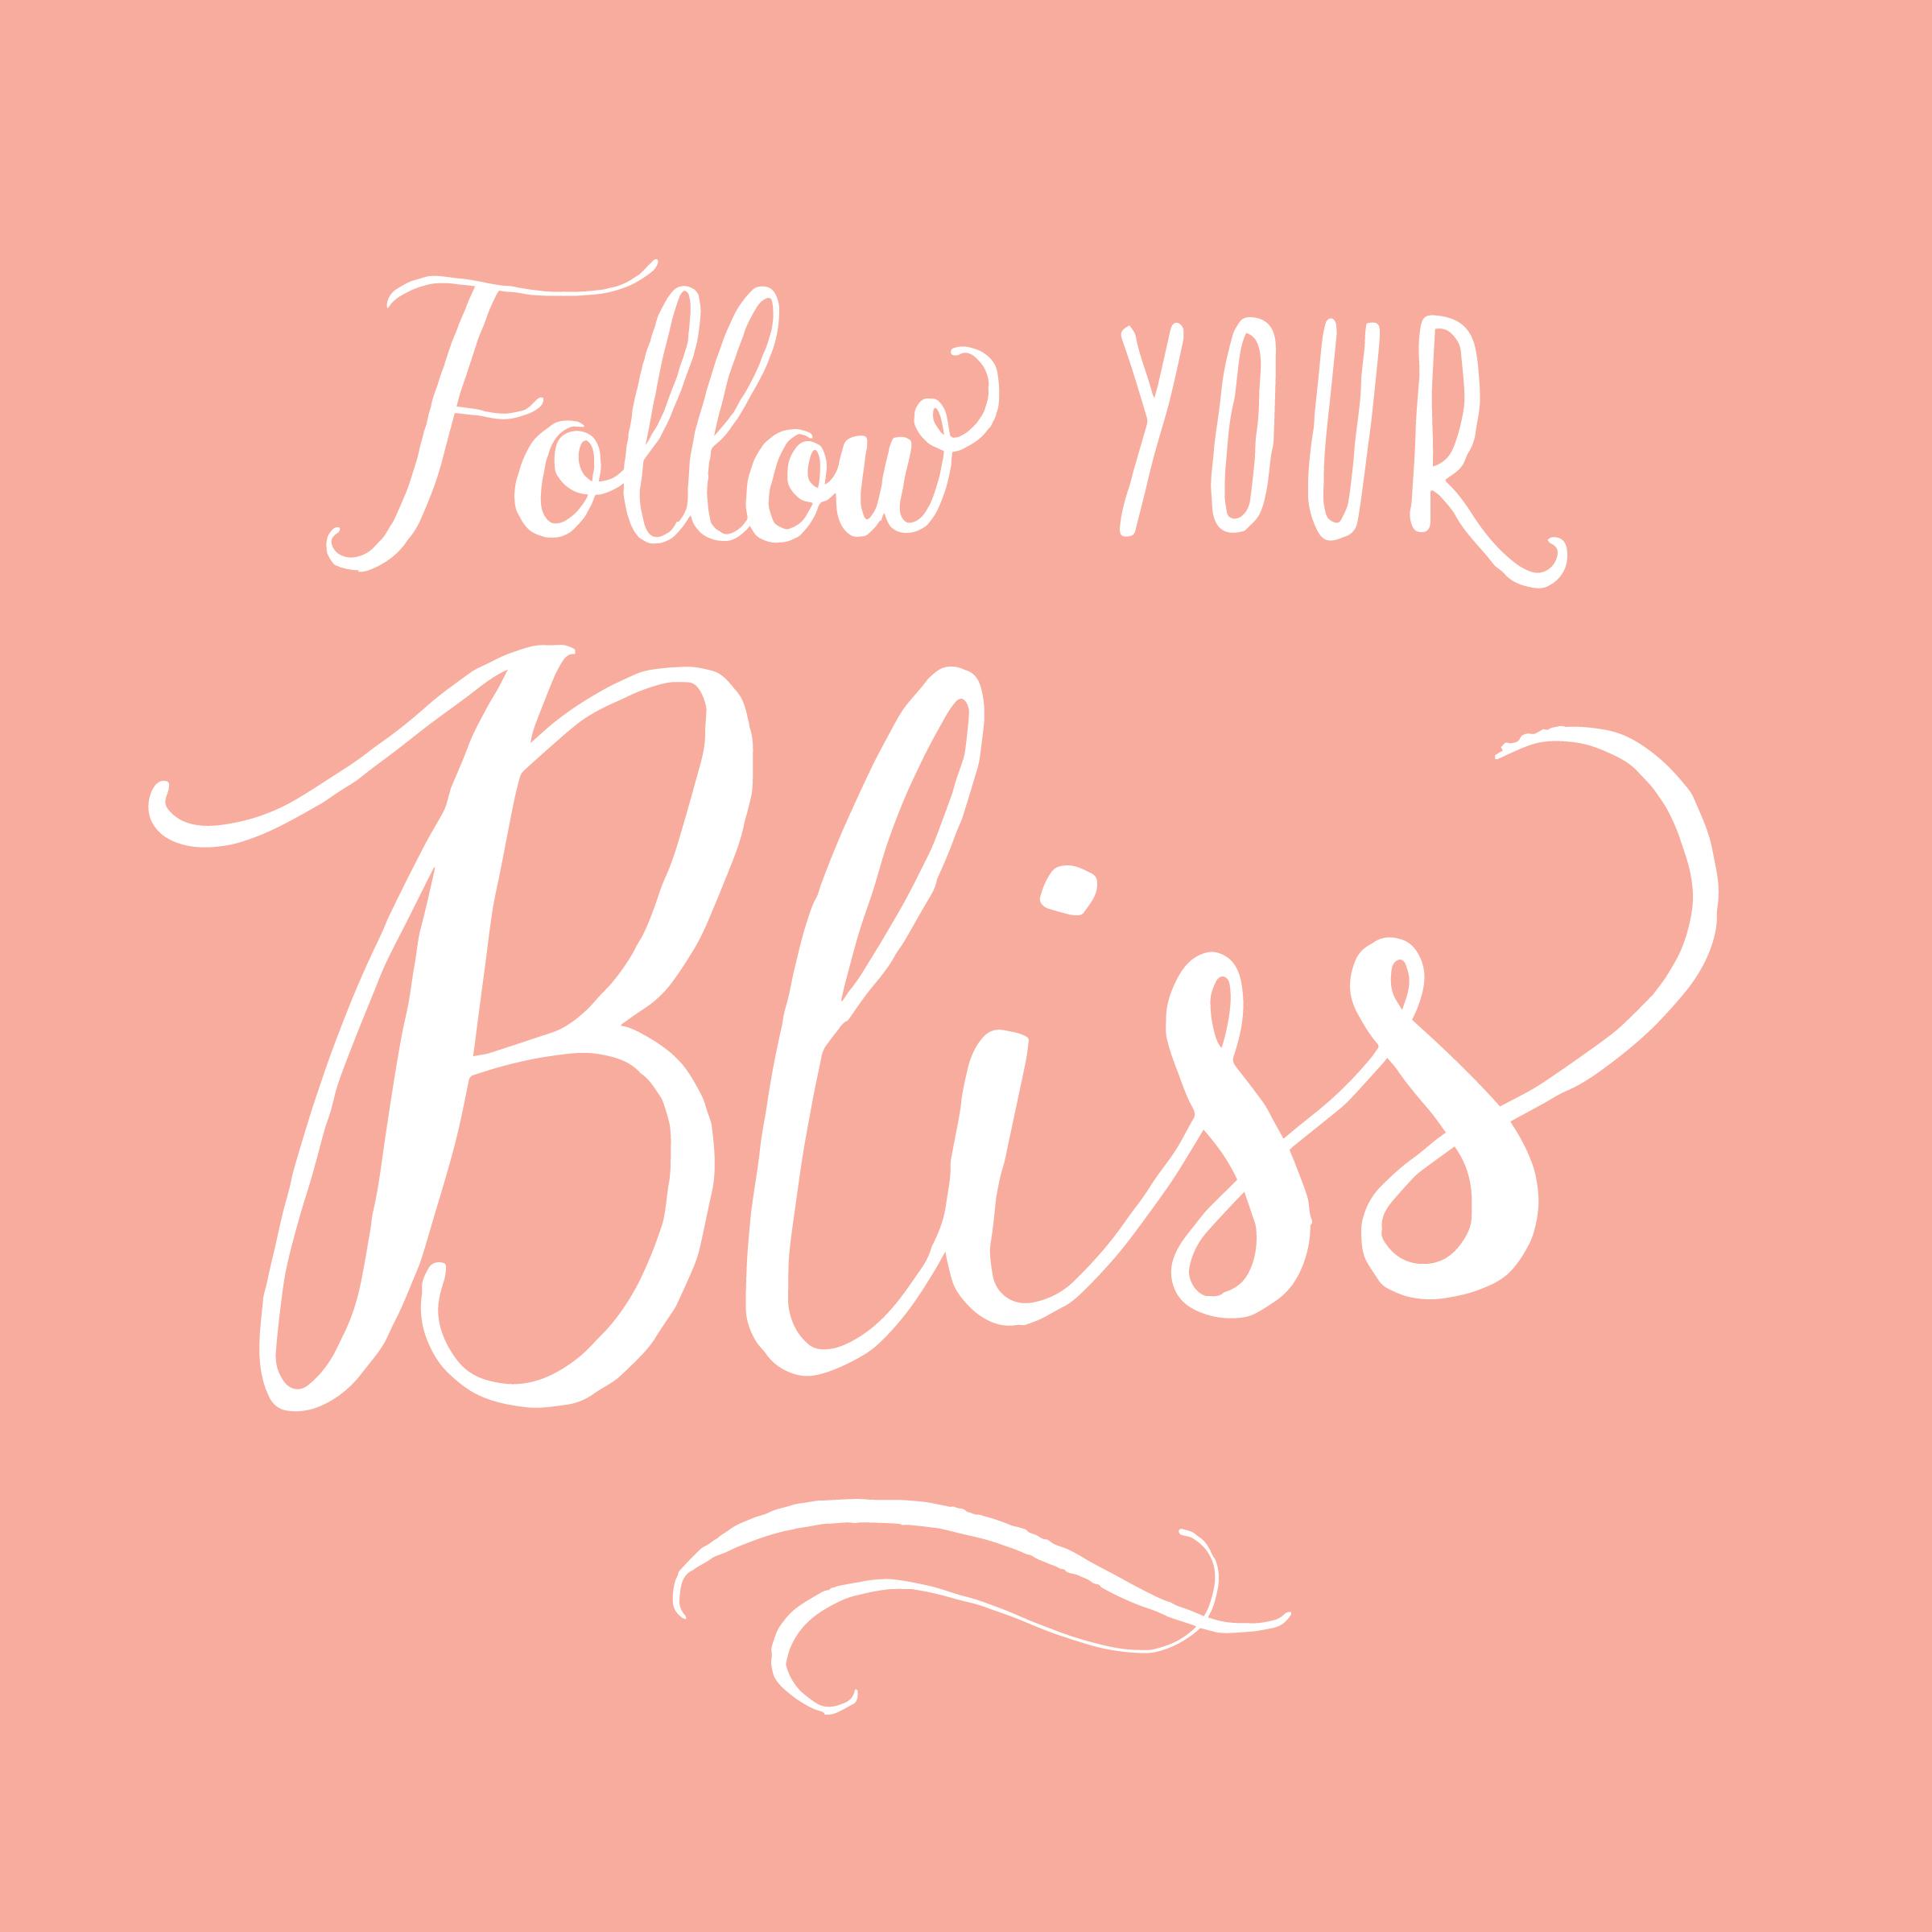 Follow Your Bliss  - andreacrofts.com.jpg